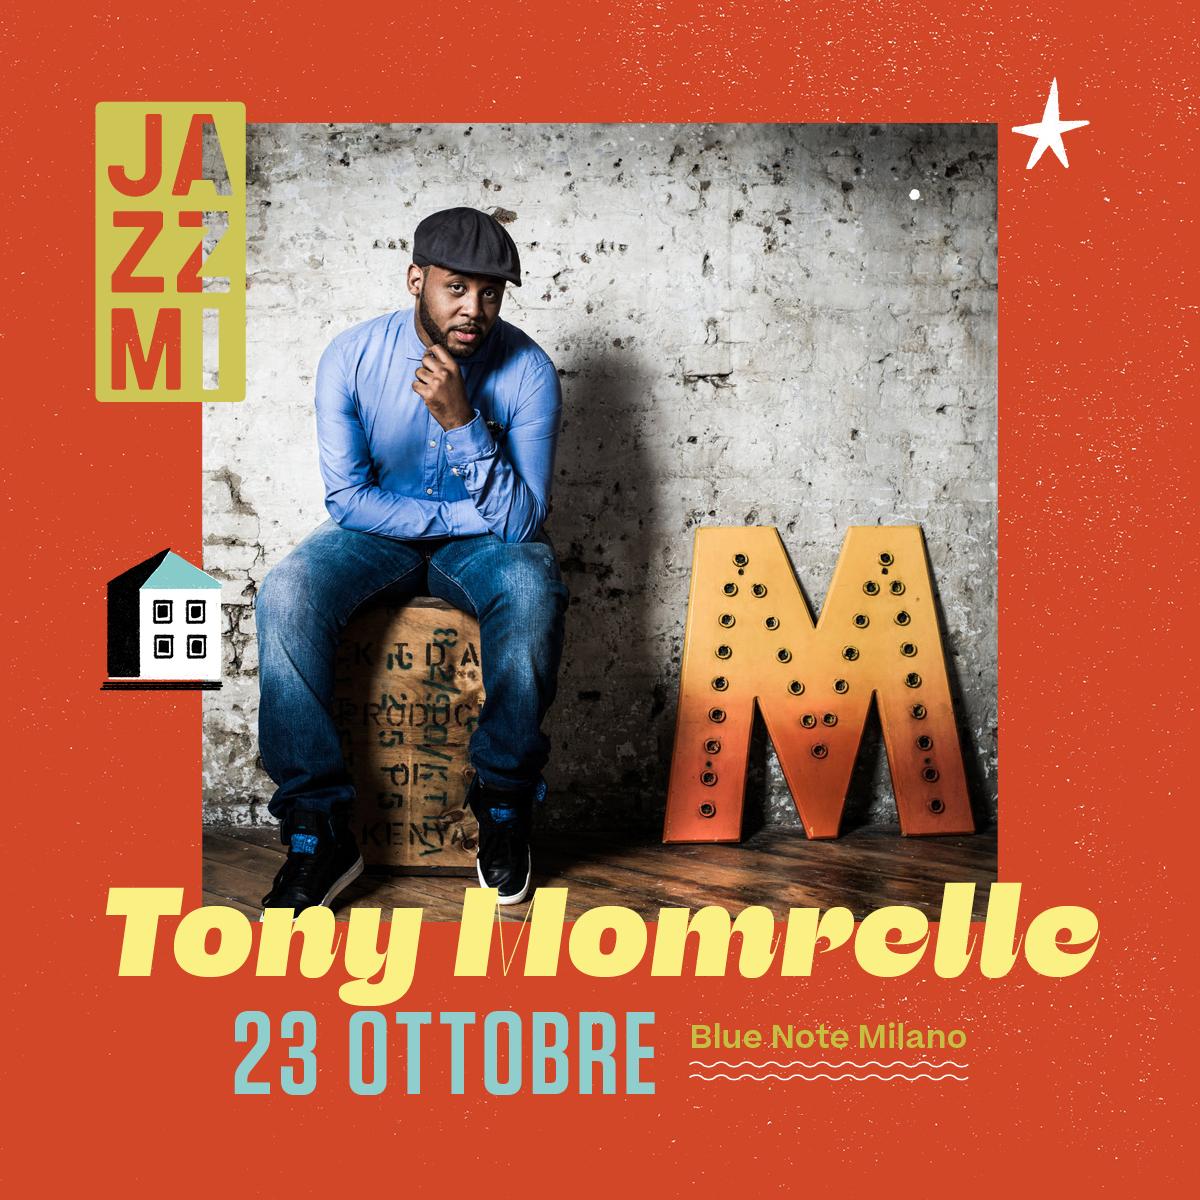 JAZZMI Tony Momrelle 23/10/2021 20.30